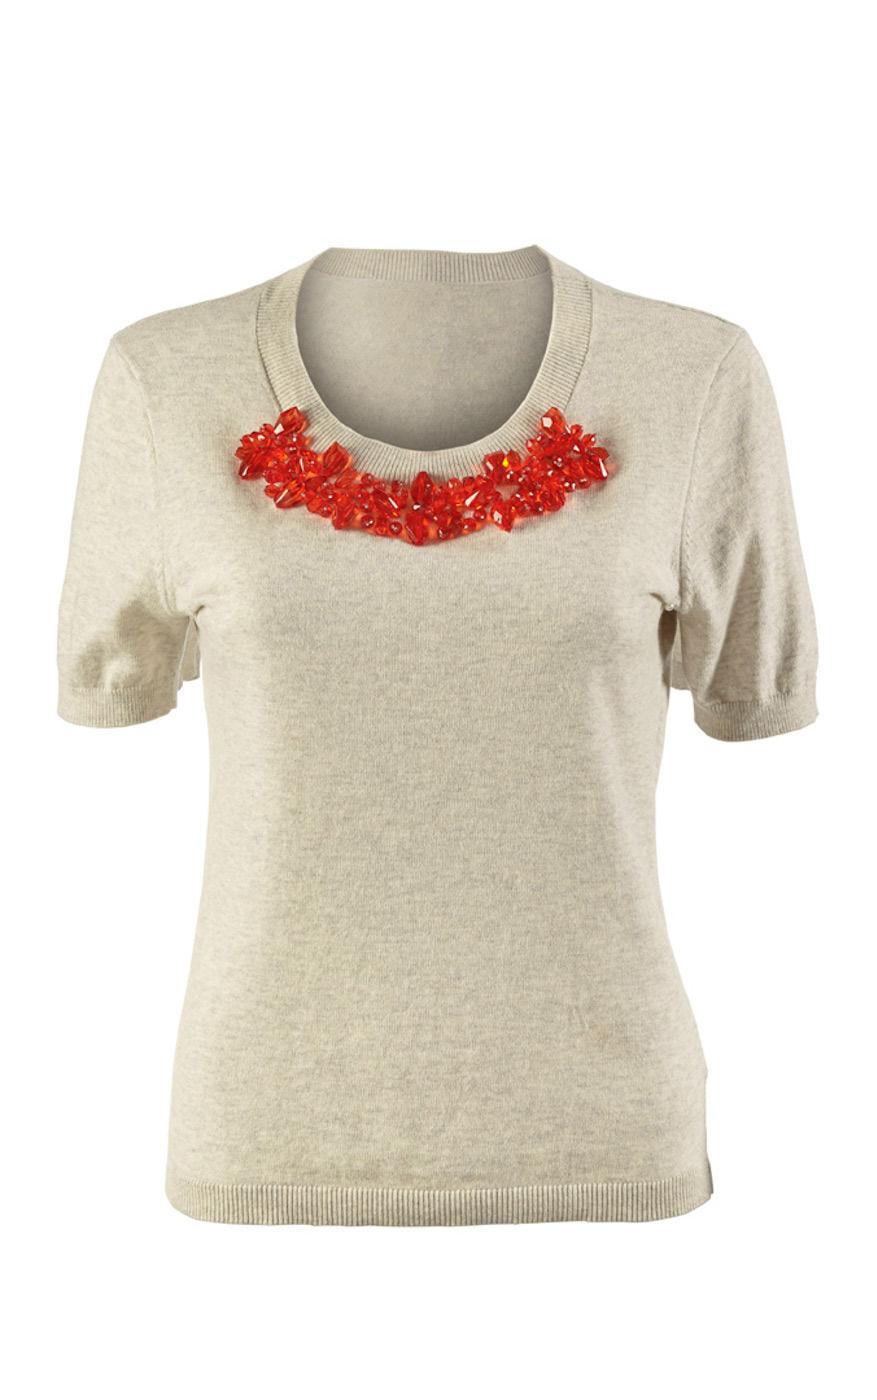 CAbi  Rock Candy Shell  Top  Größe M Medium  Style  NWT  Retail  nl=